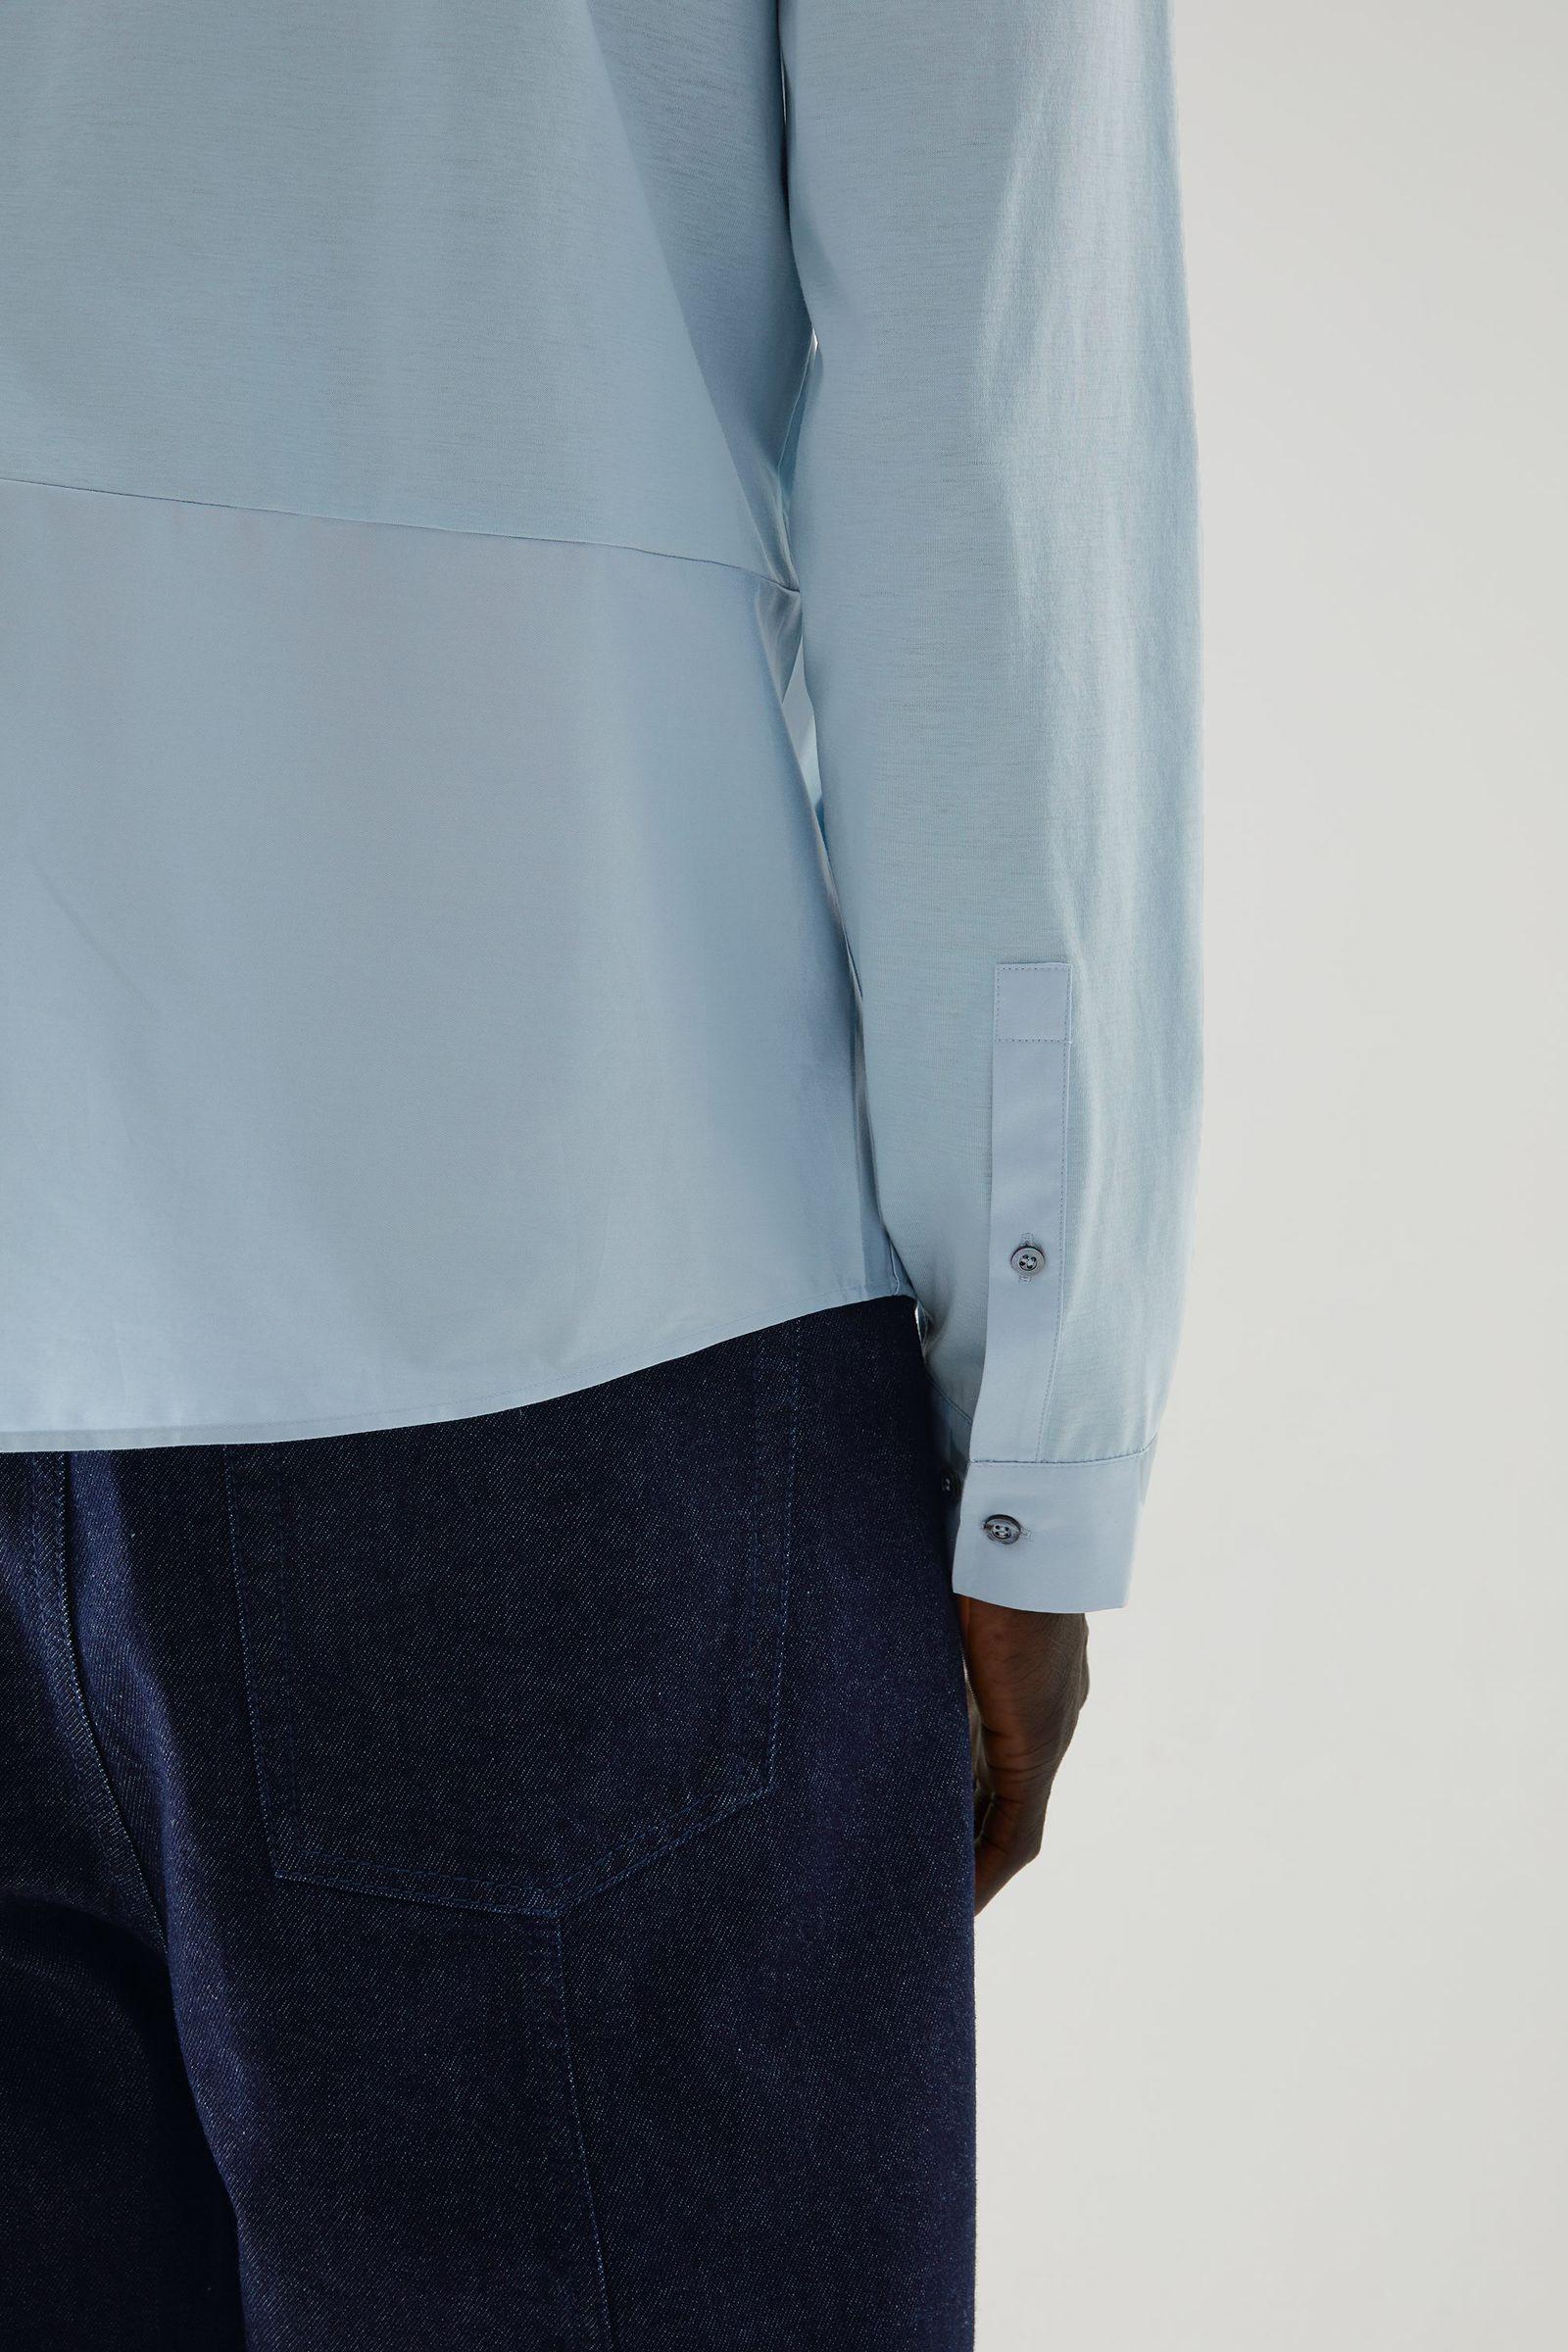 COS 오가닉 코튼 컨트래스트 패널 셔츠의 라이트 블루컬러 ECOMLook입니다.